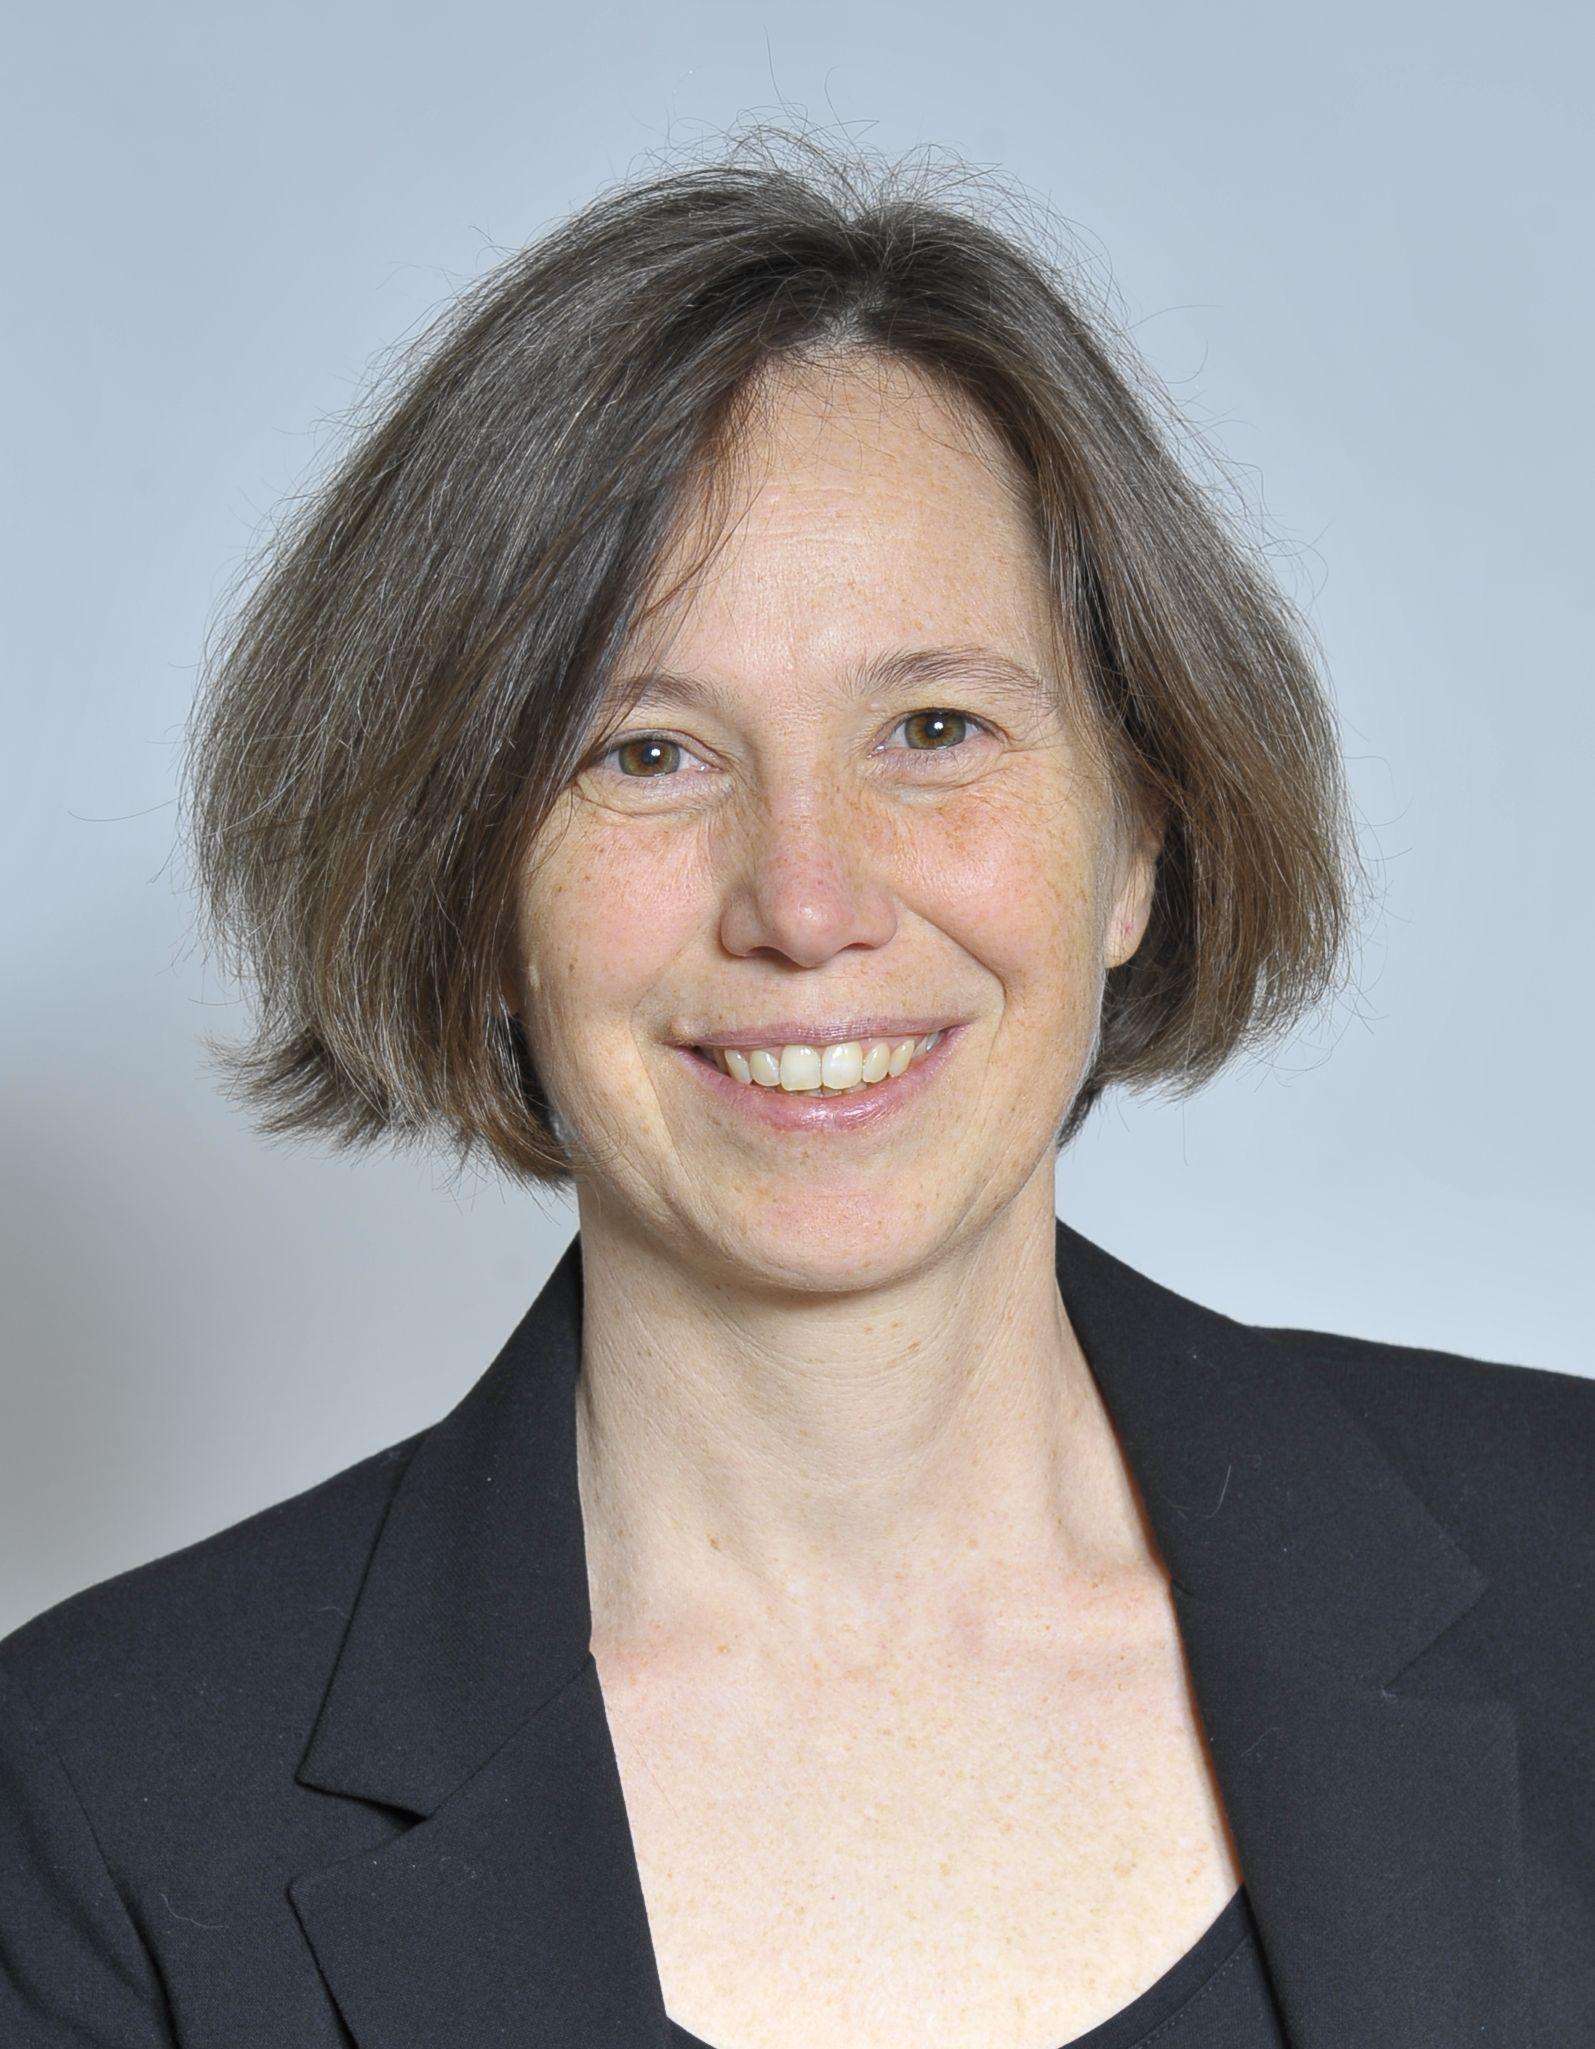 Eva Aigner-Breuss